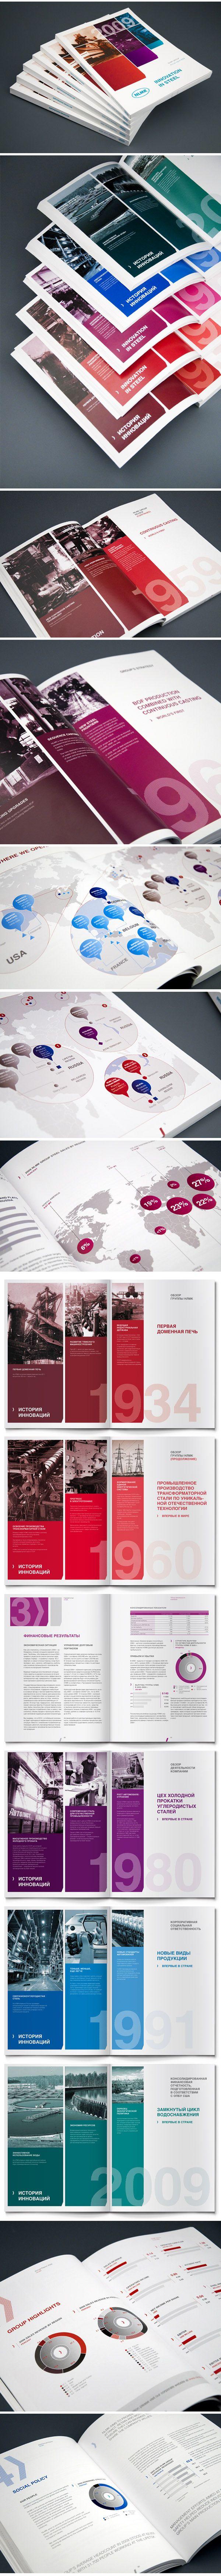 annual report NLMK by Andrew Gorkovenko, via Behance